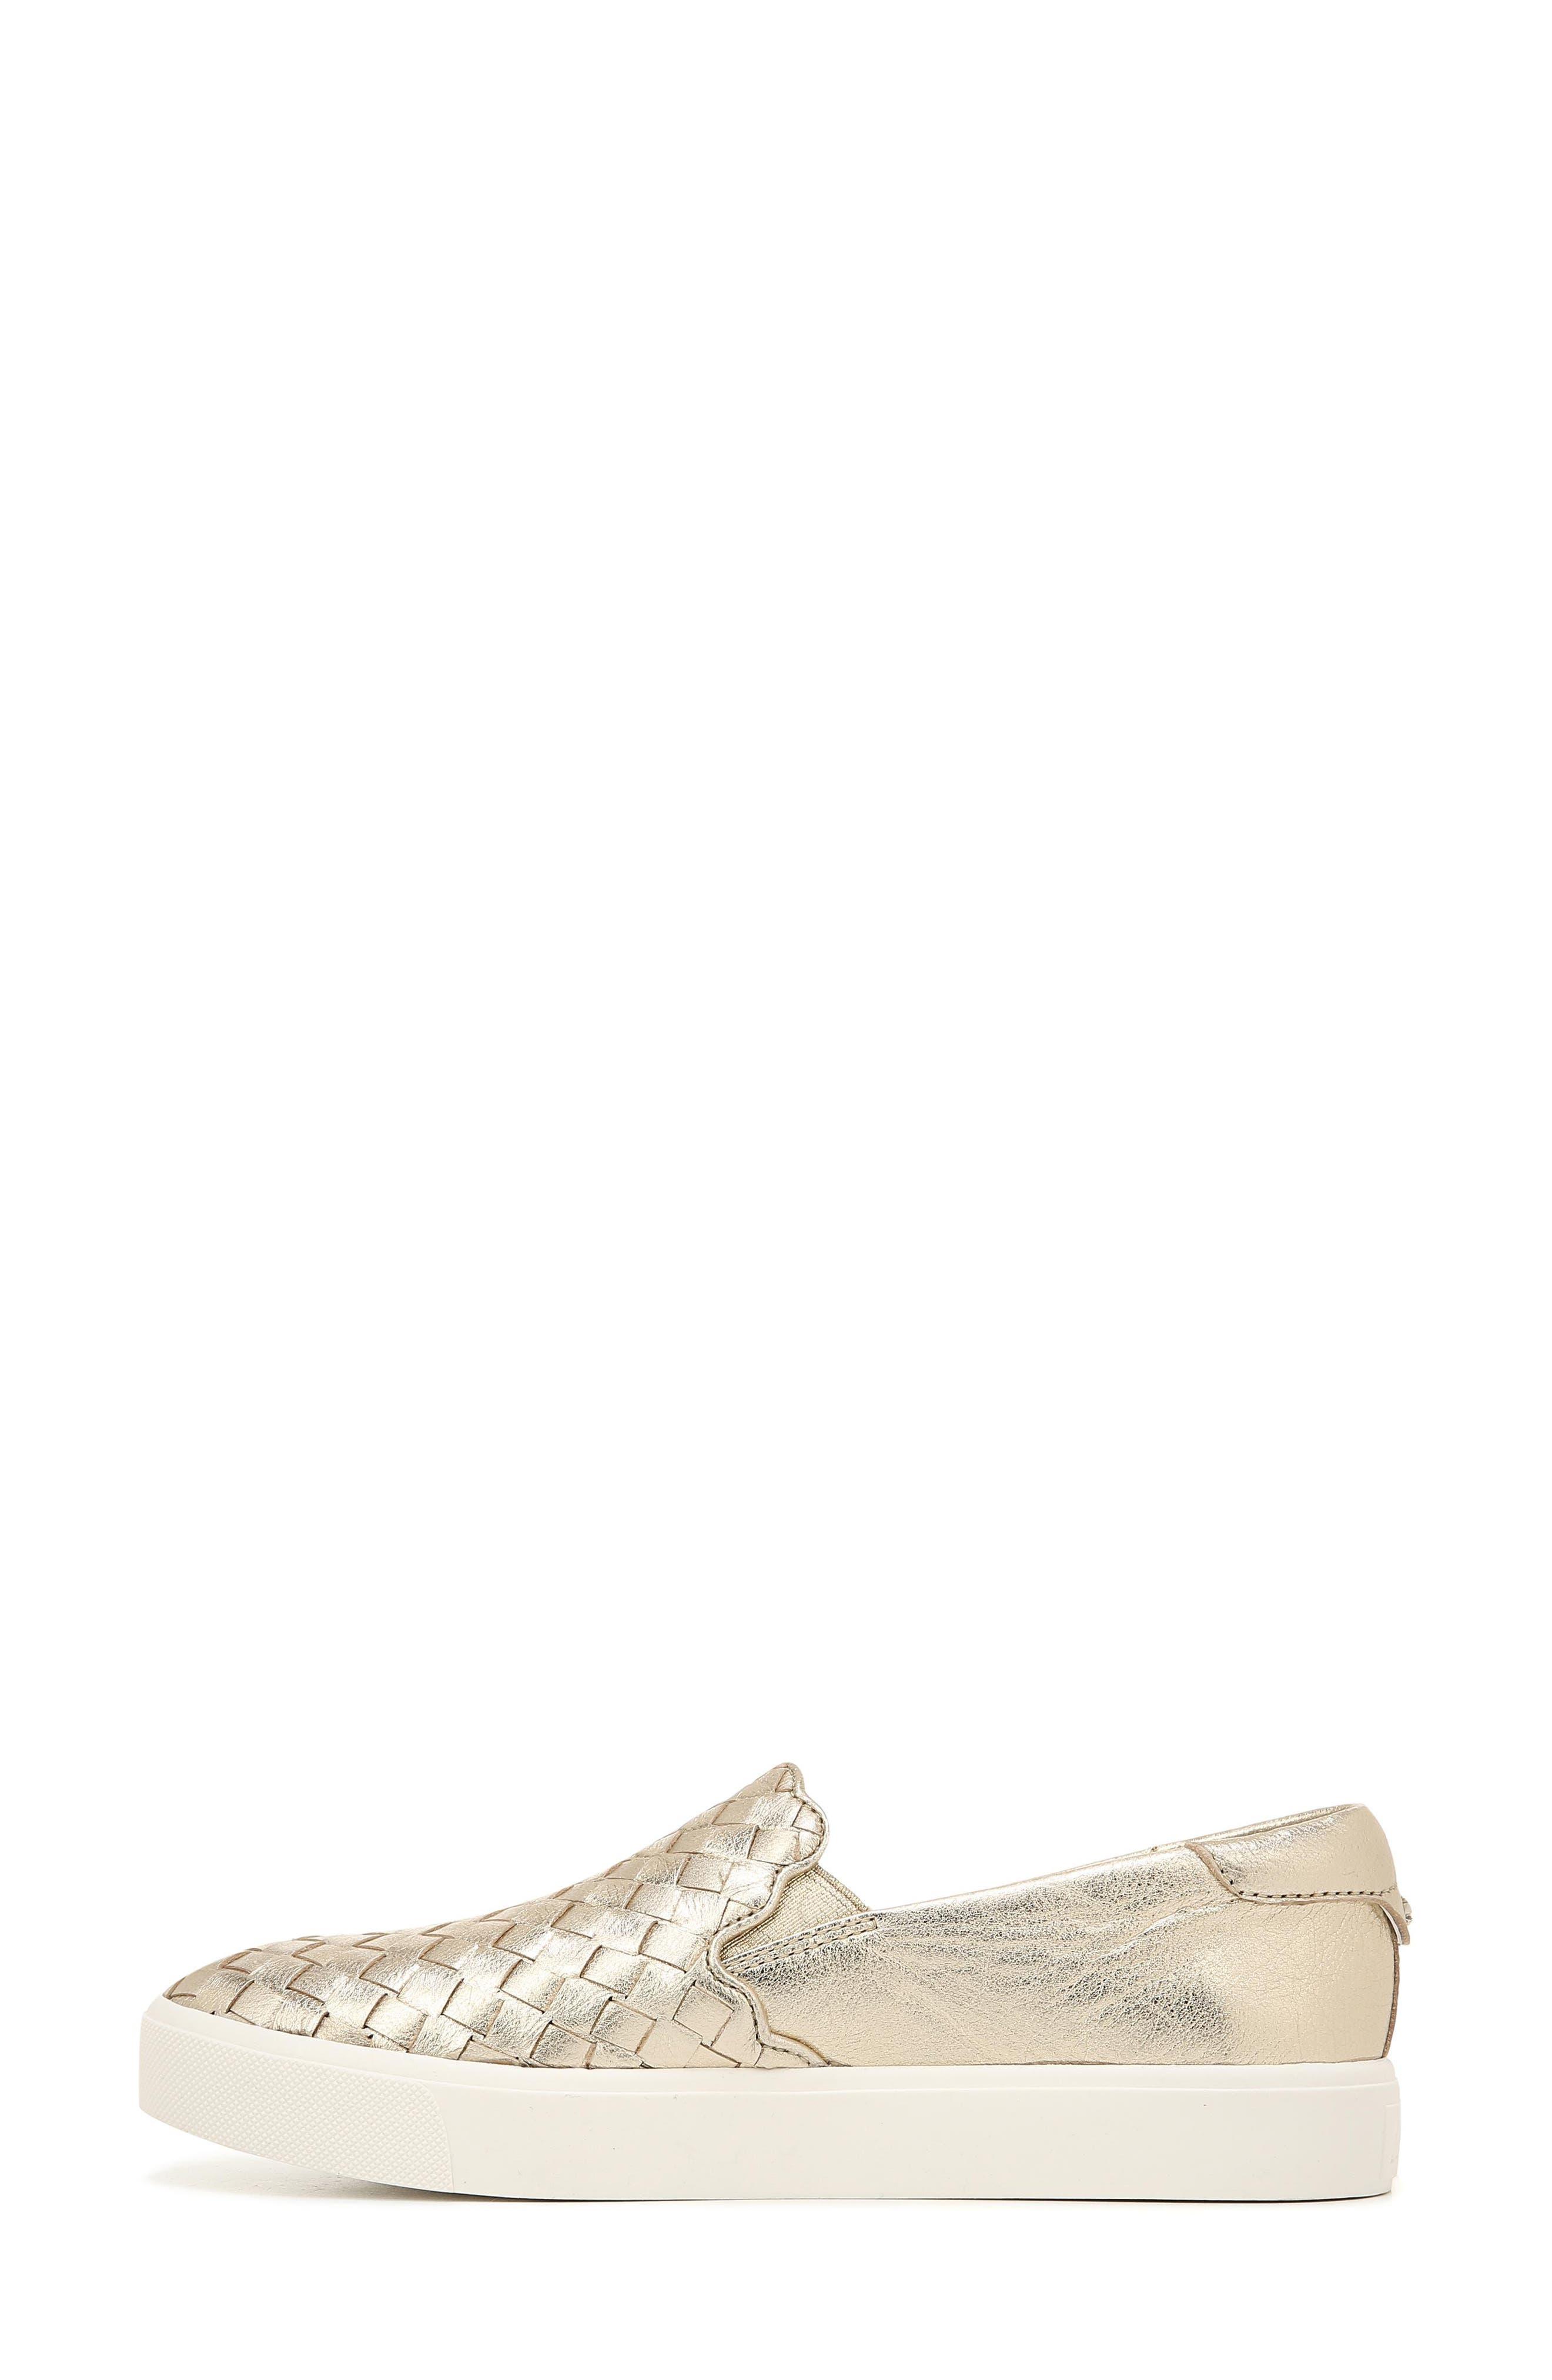 SAM EDELMAN, Eda Sneaker, Alternate thumbnail 9, color, MOLTEN GOLD LEATHER